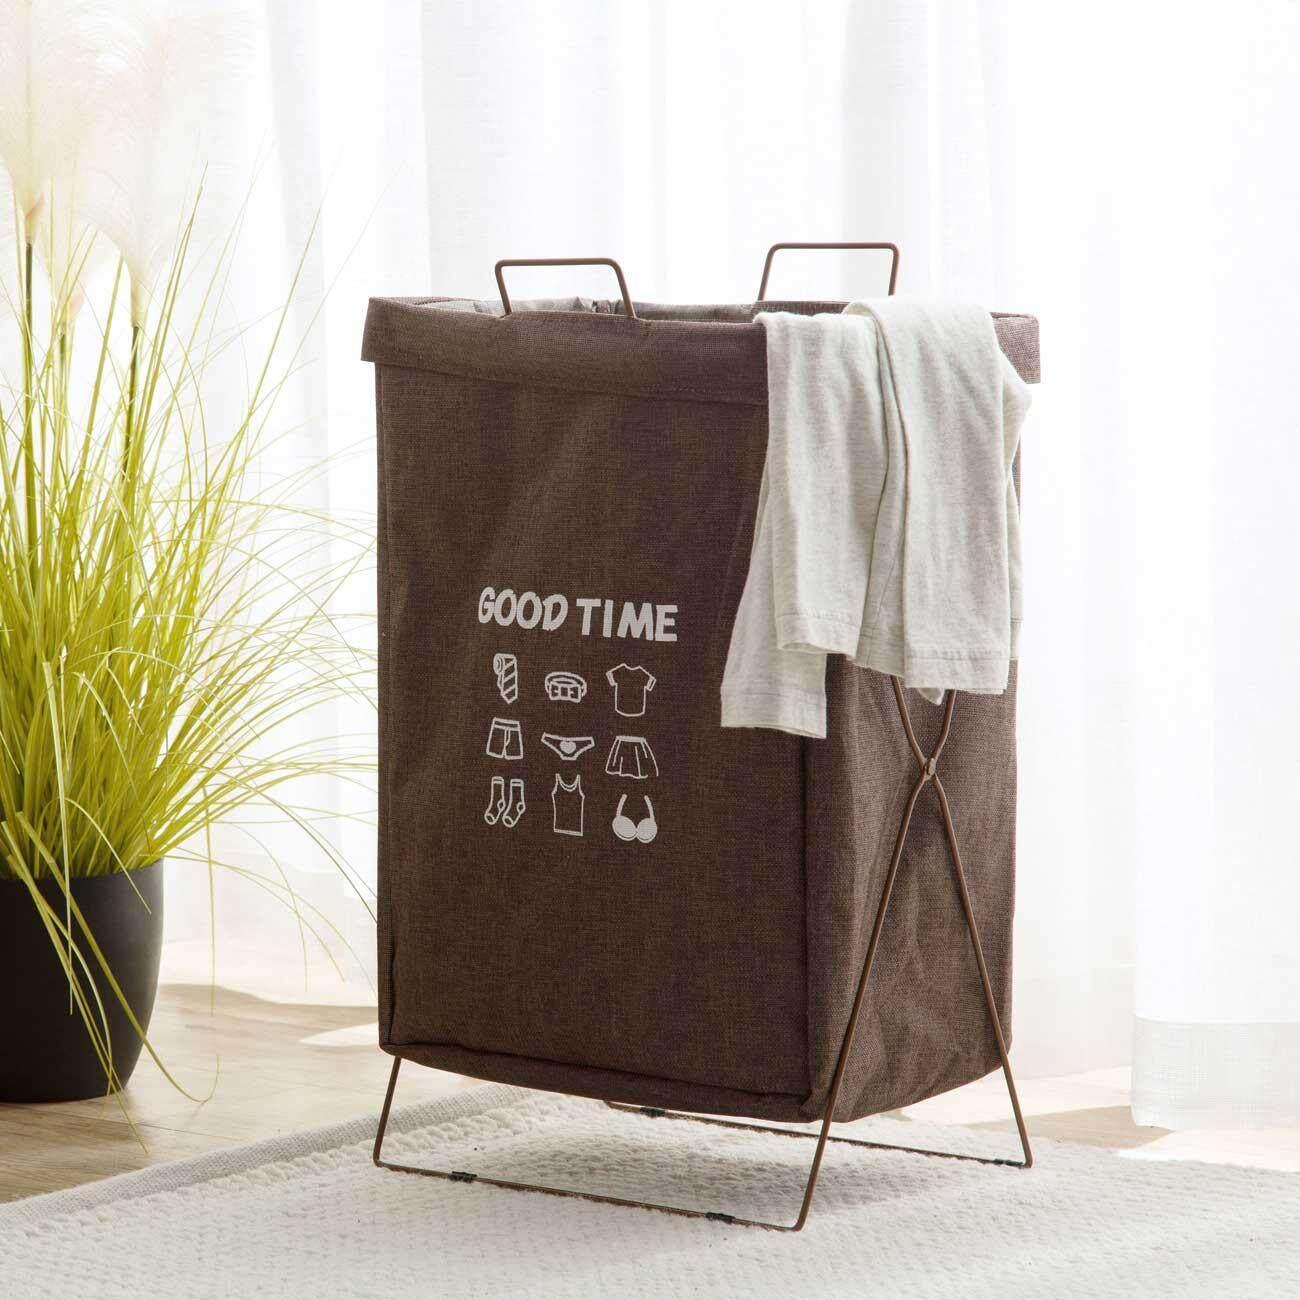 58320c47c9b Homenhome 1 pcs Laundry Basket Foldable Laundry Hamper with Iron Stand